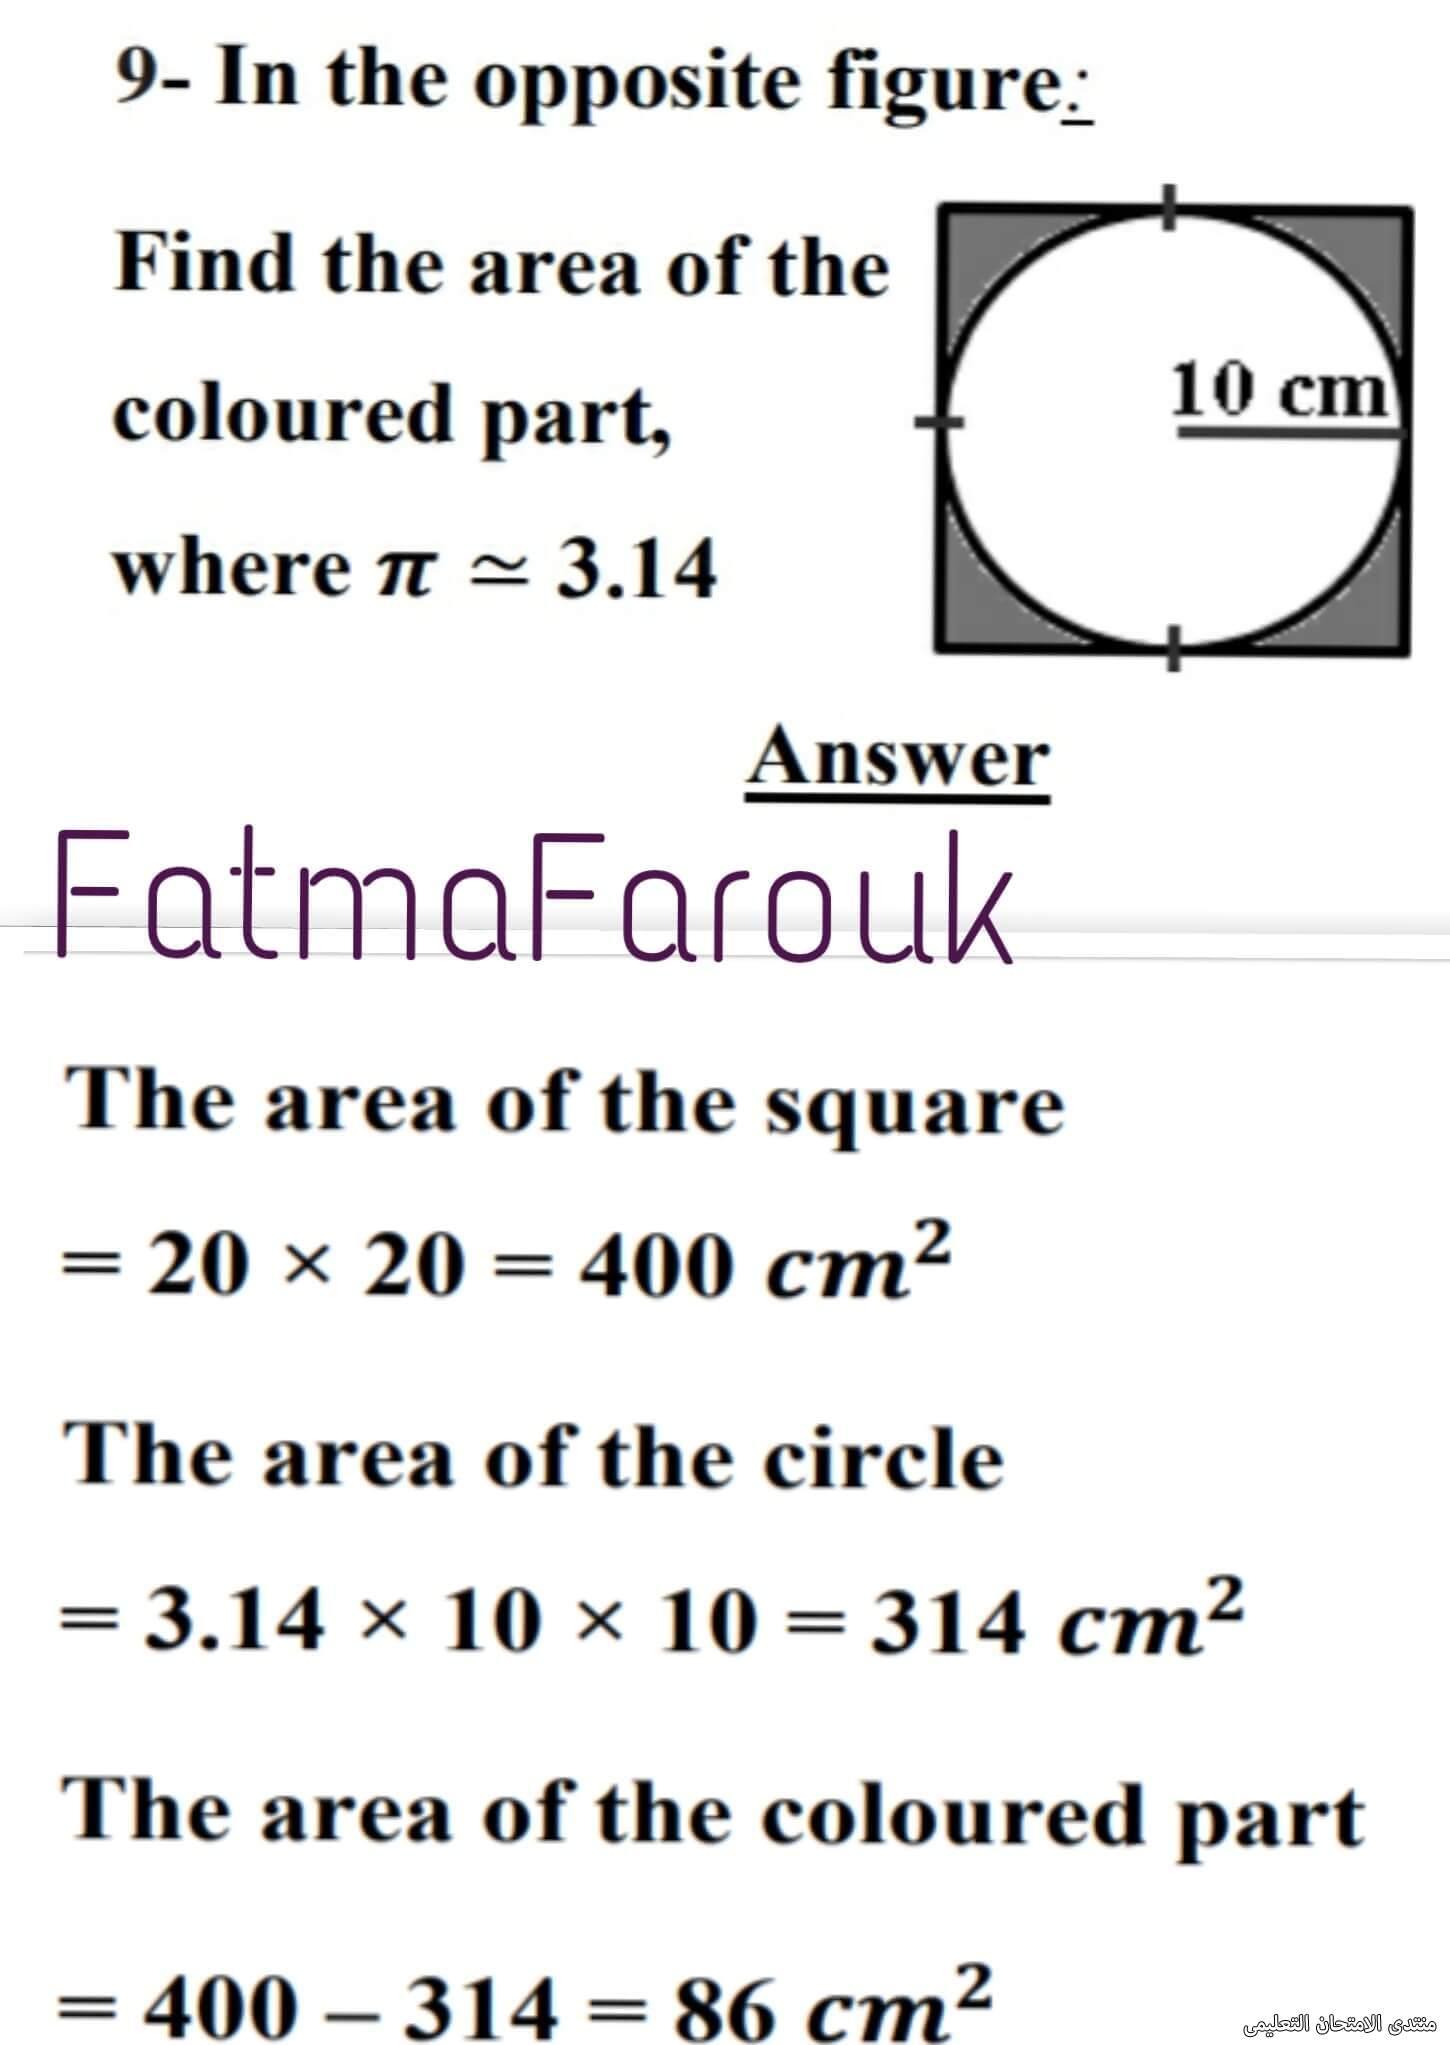 exam-eg.com_1616321344981118.jpg